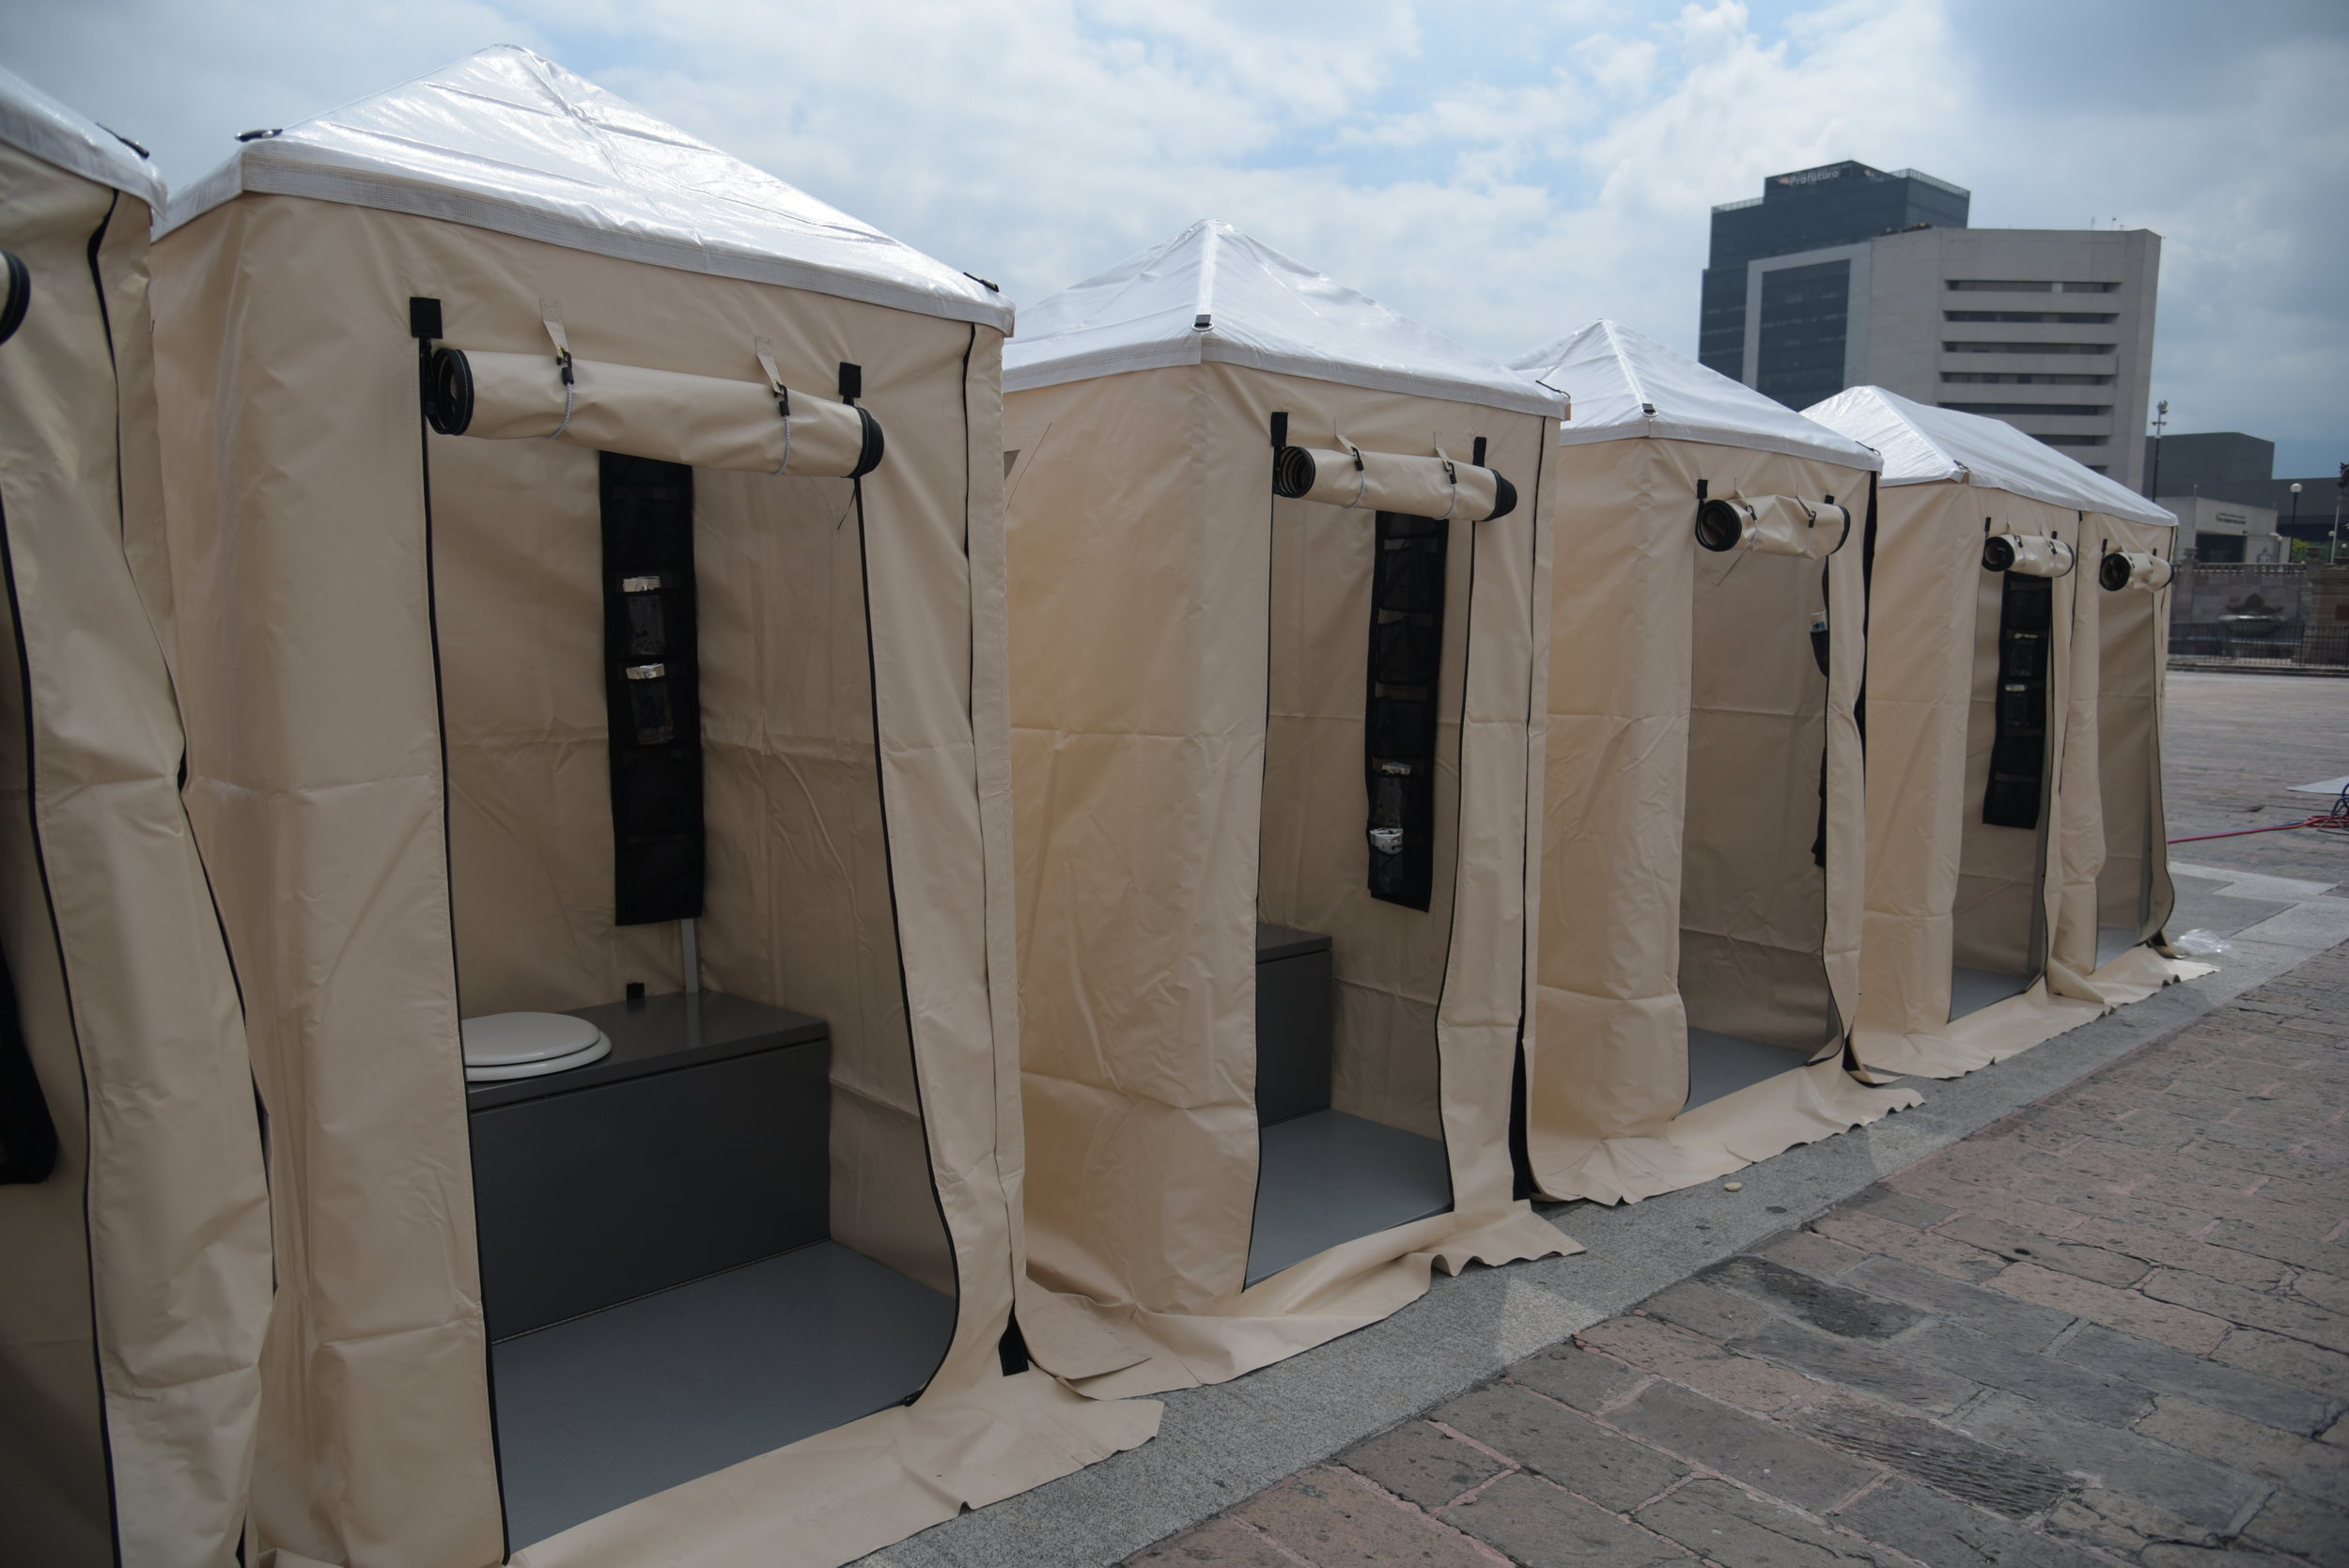 shelter toilets